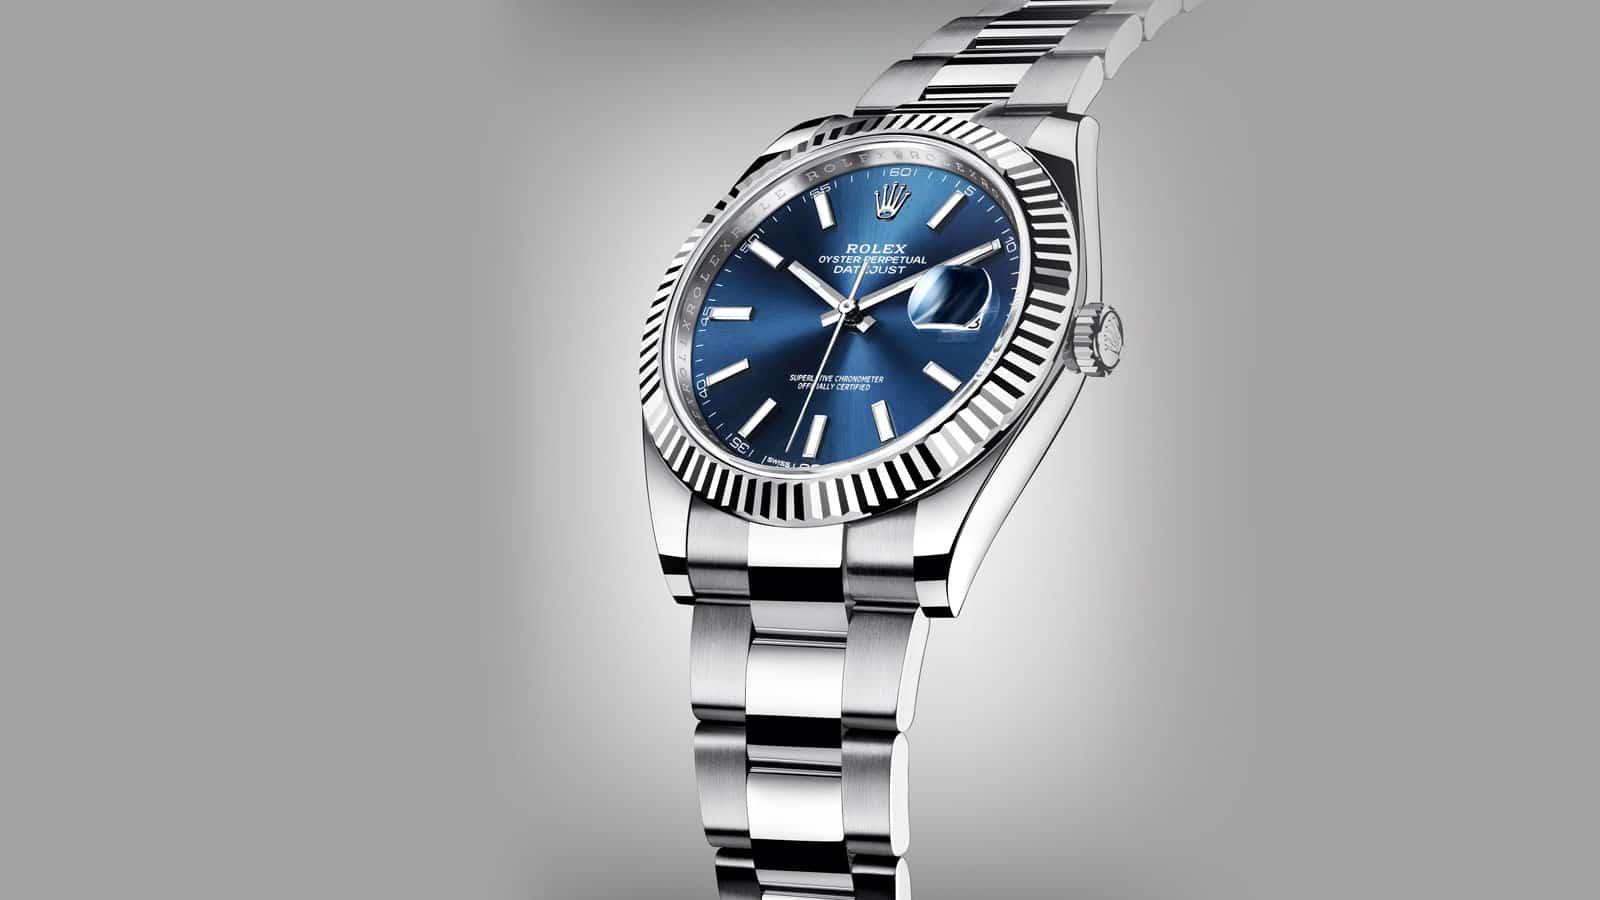 Montre-Rolex-Datejust_41_126334_Lionel-Meylan-horlogerie-joaillerie-vevey